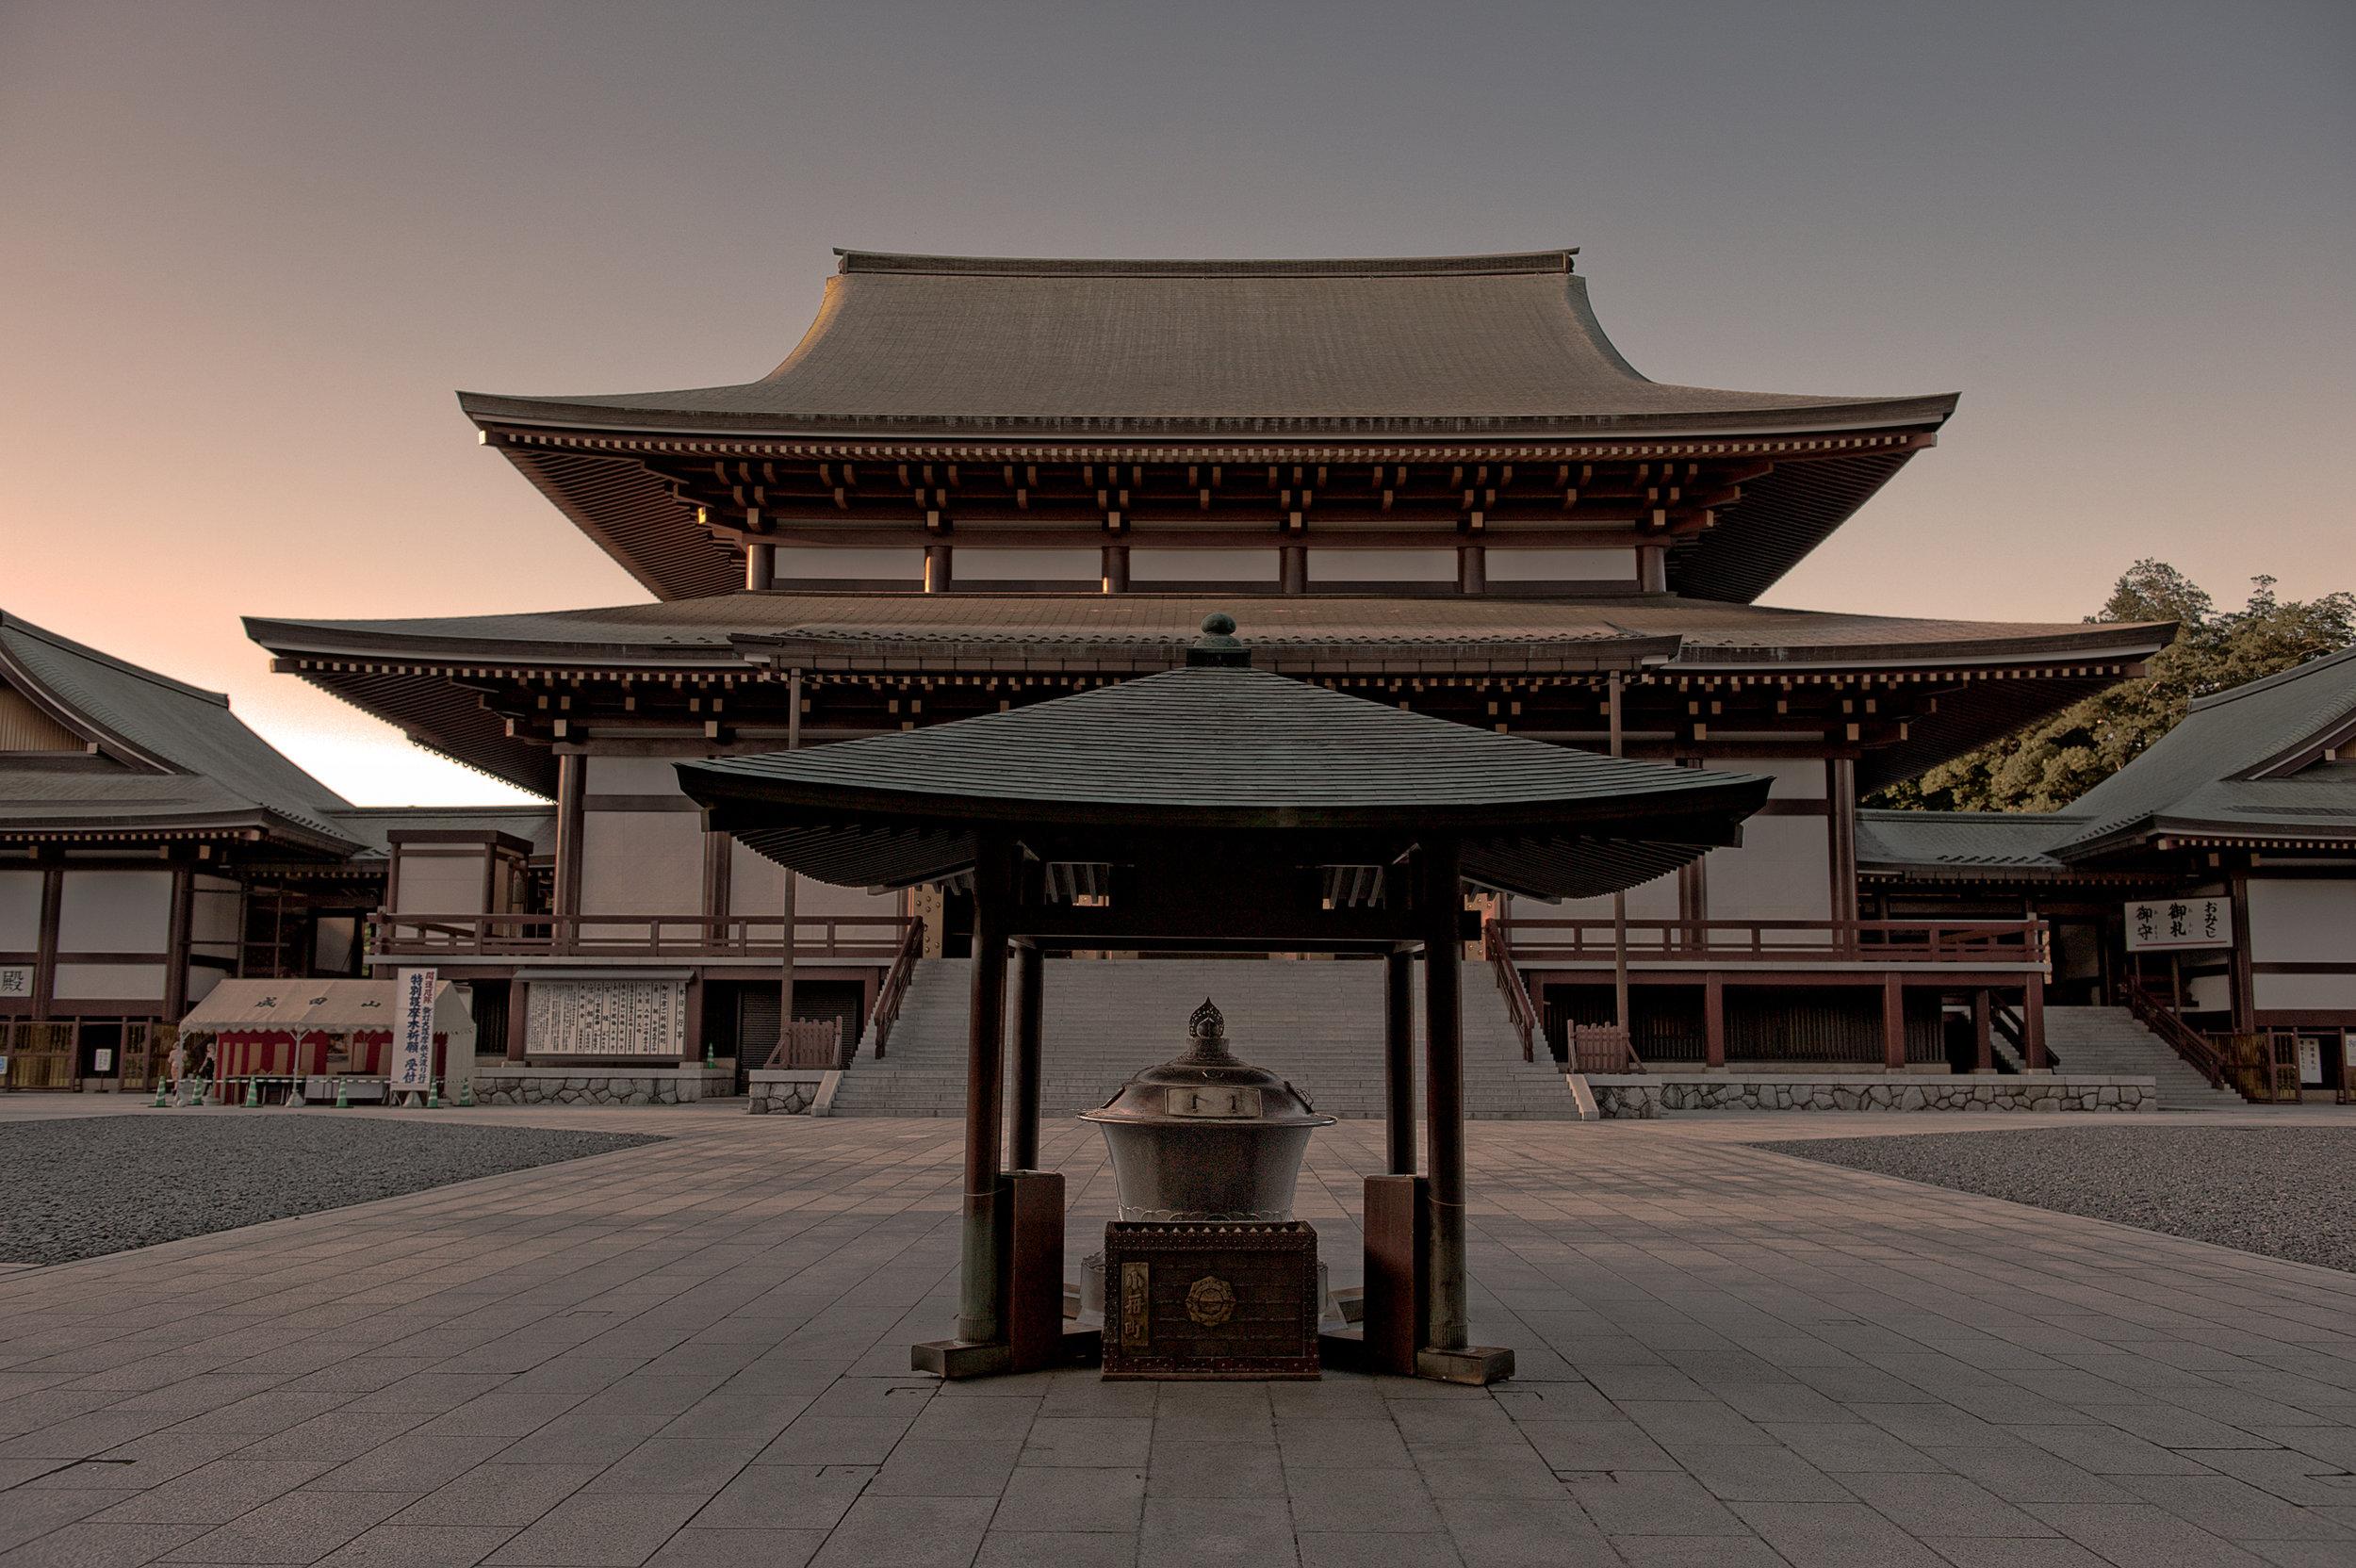 Japan-John Bardell-0459a.jpg